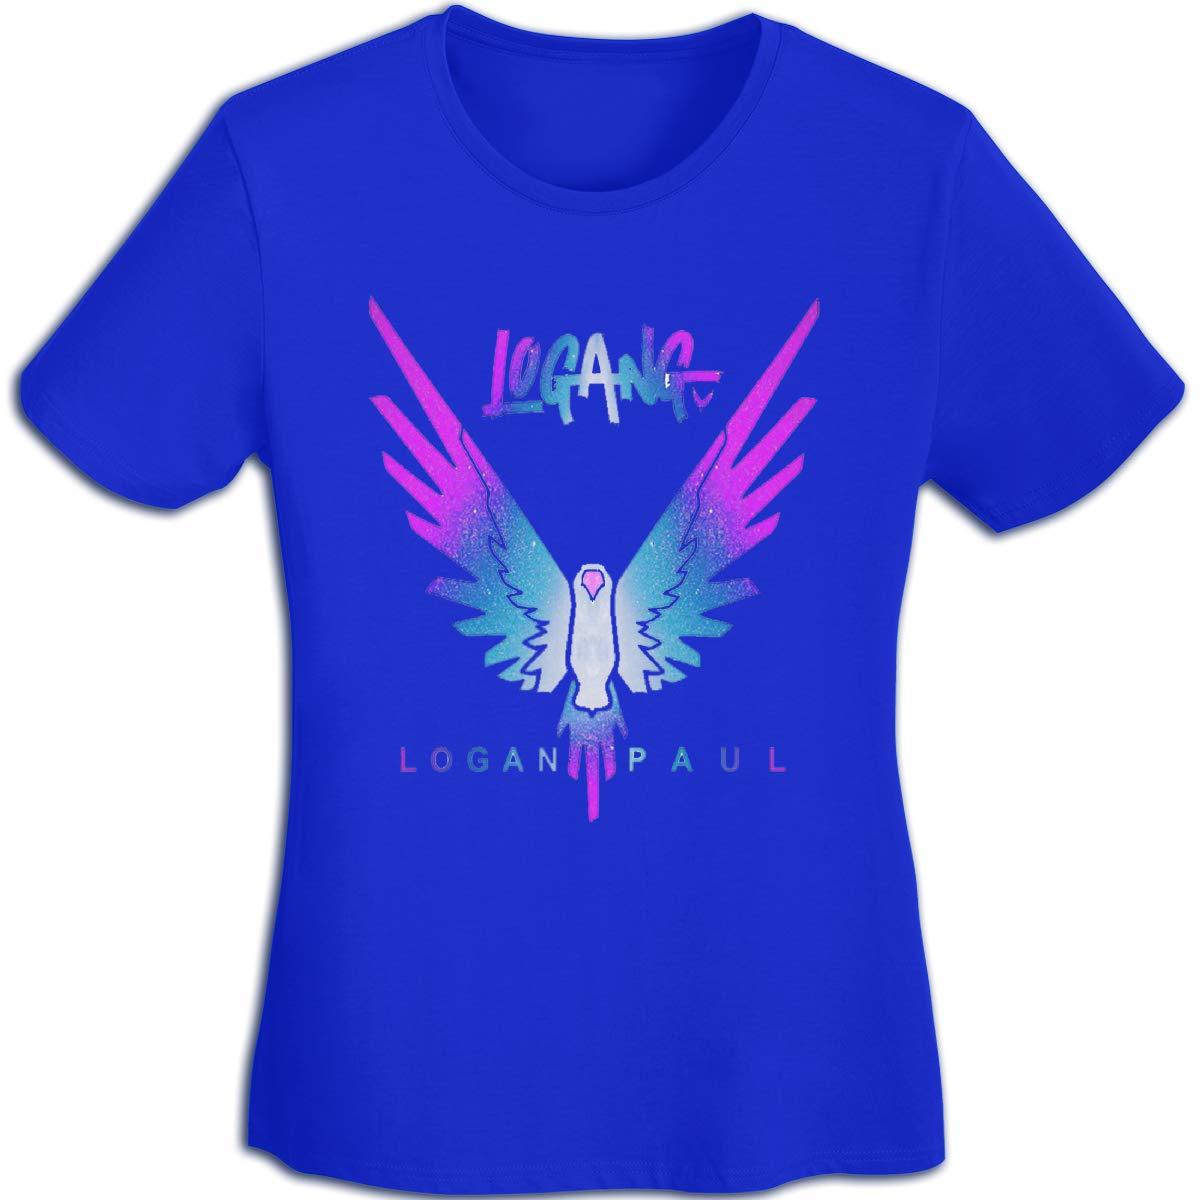 Women's T Shirt Jake Paul Logang Logan Paul Maverick Tee Shirts T-Shirt Short-Sleeve Round Neck Tshirt for Womens Girls Blue XL by BKashy